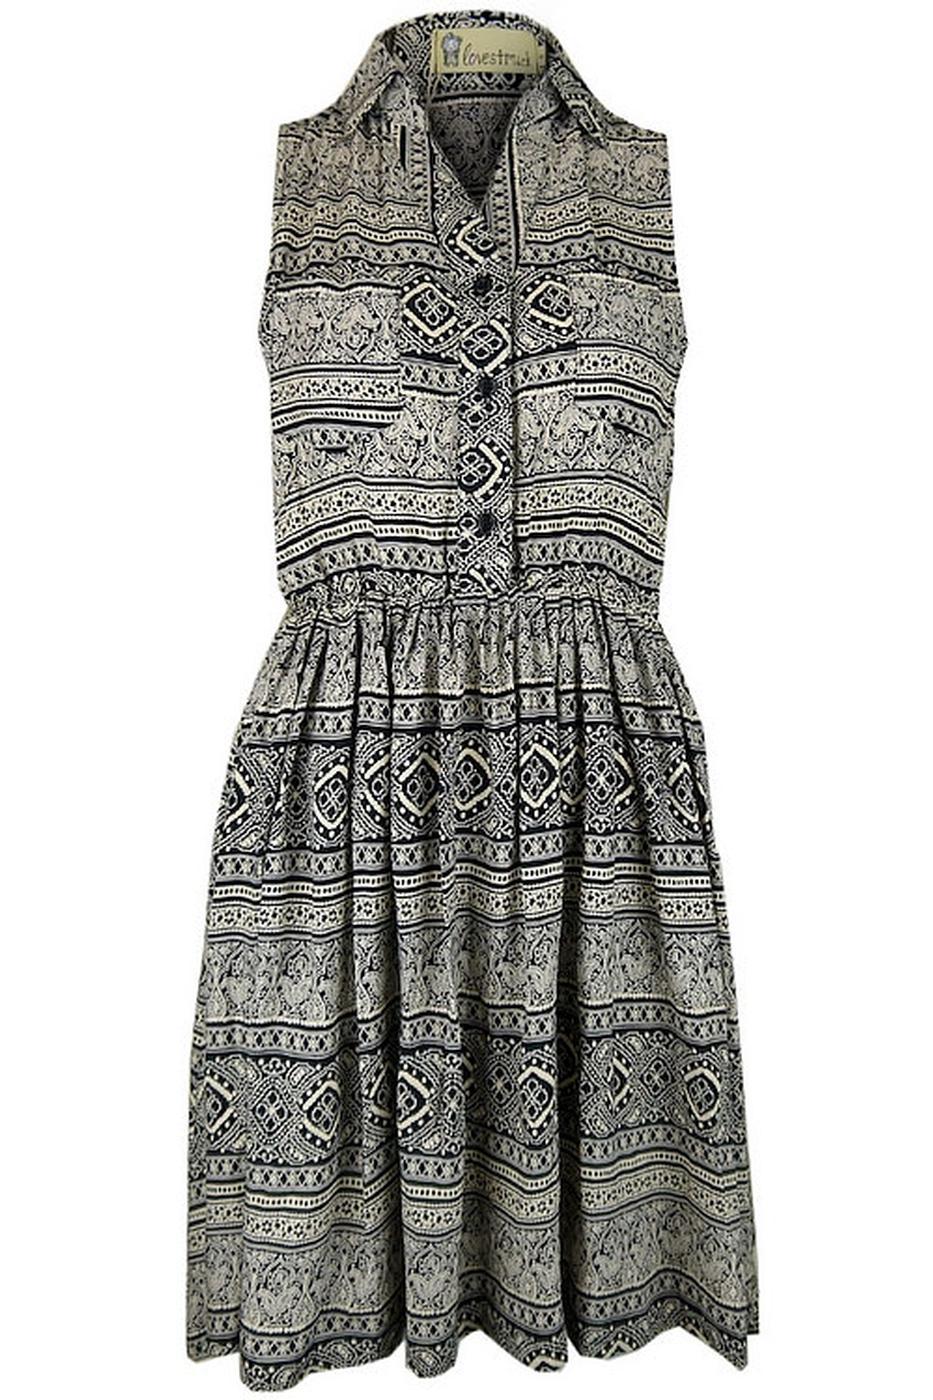 Amanda LOVESTRUCK Retro Folk Print Shirt Dress